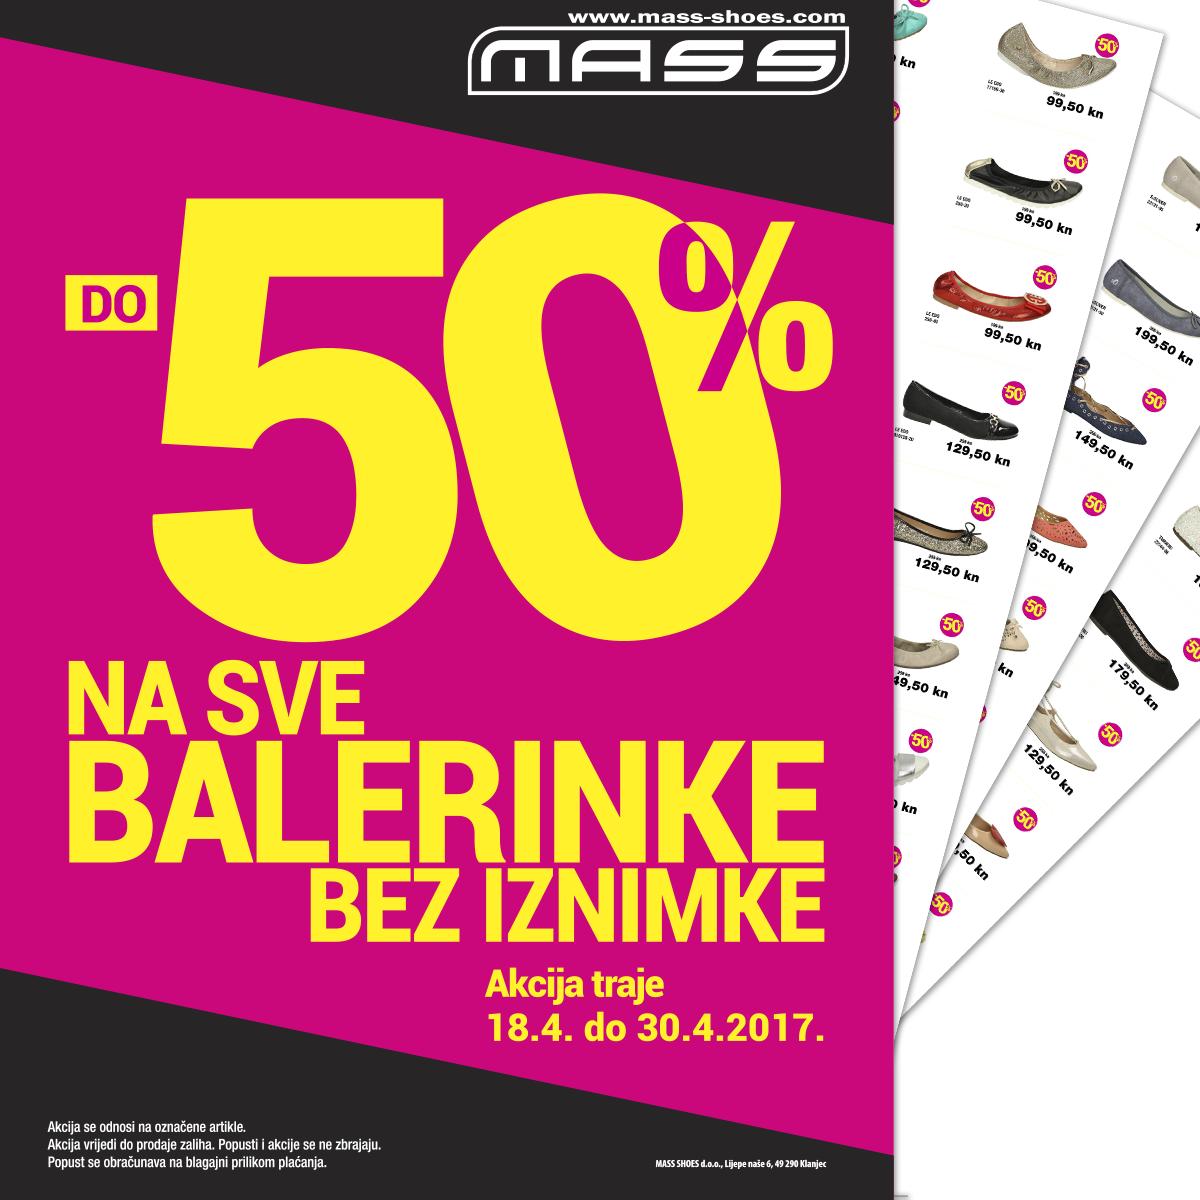 HRV-MASS ZA FACEBOOK